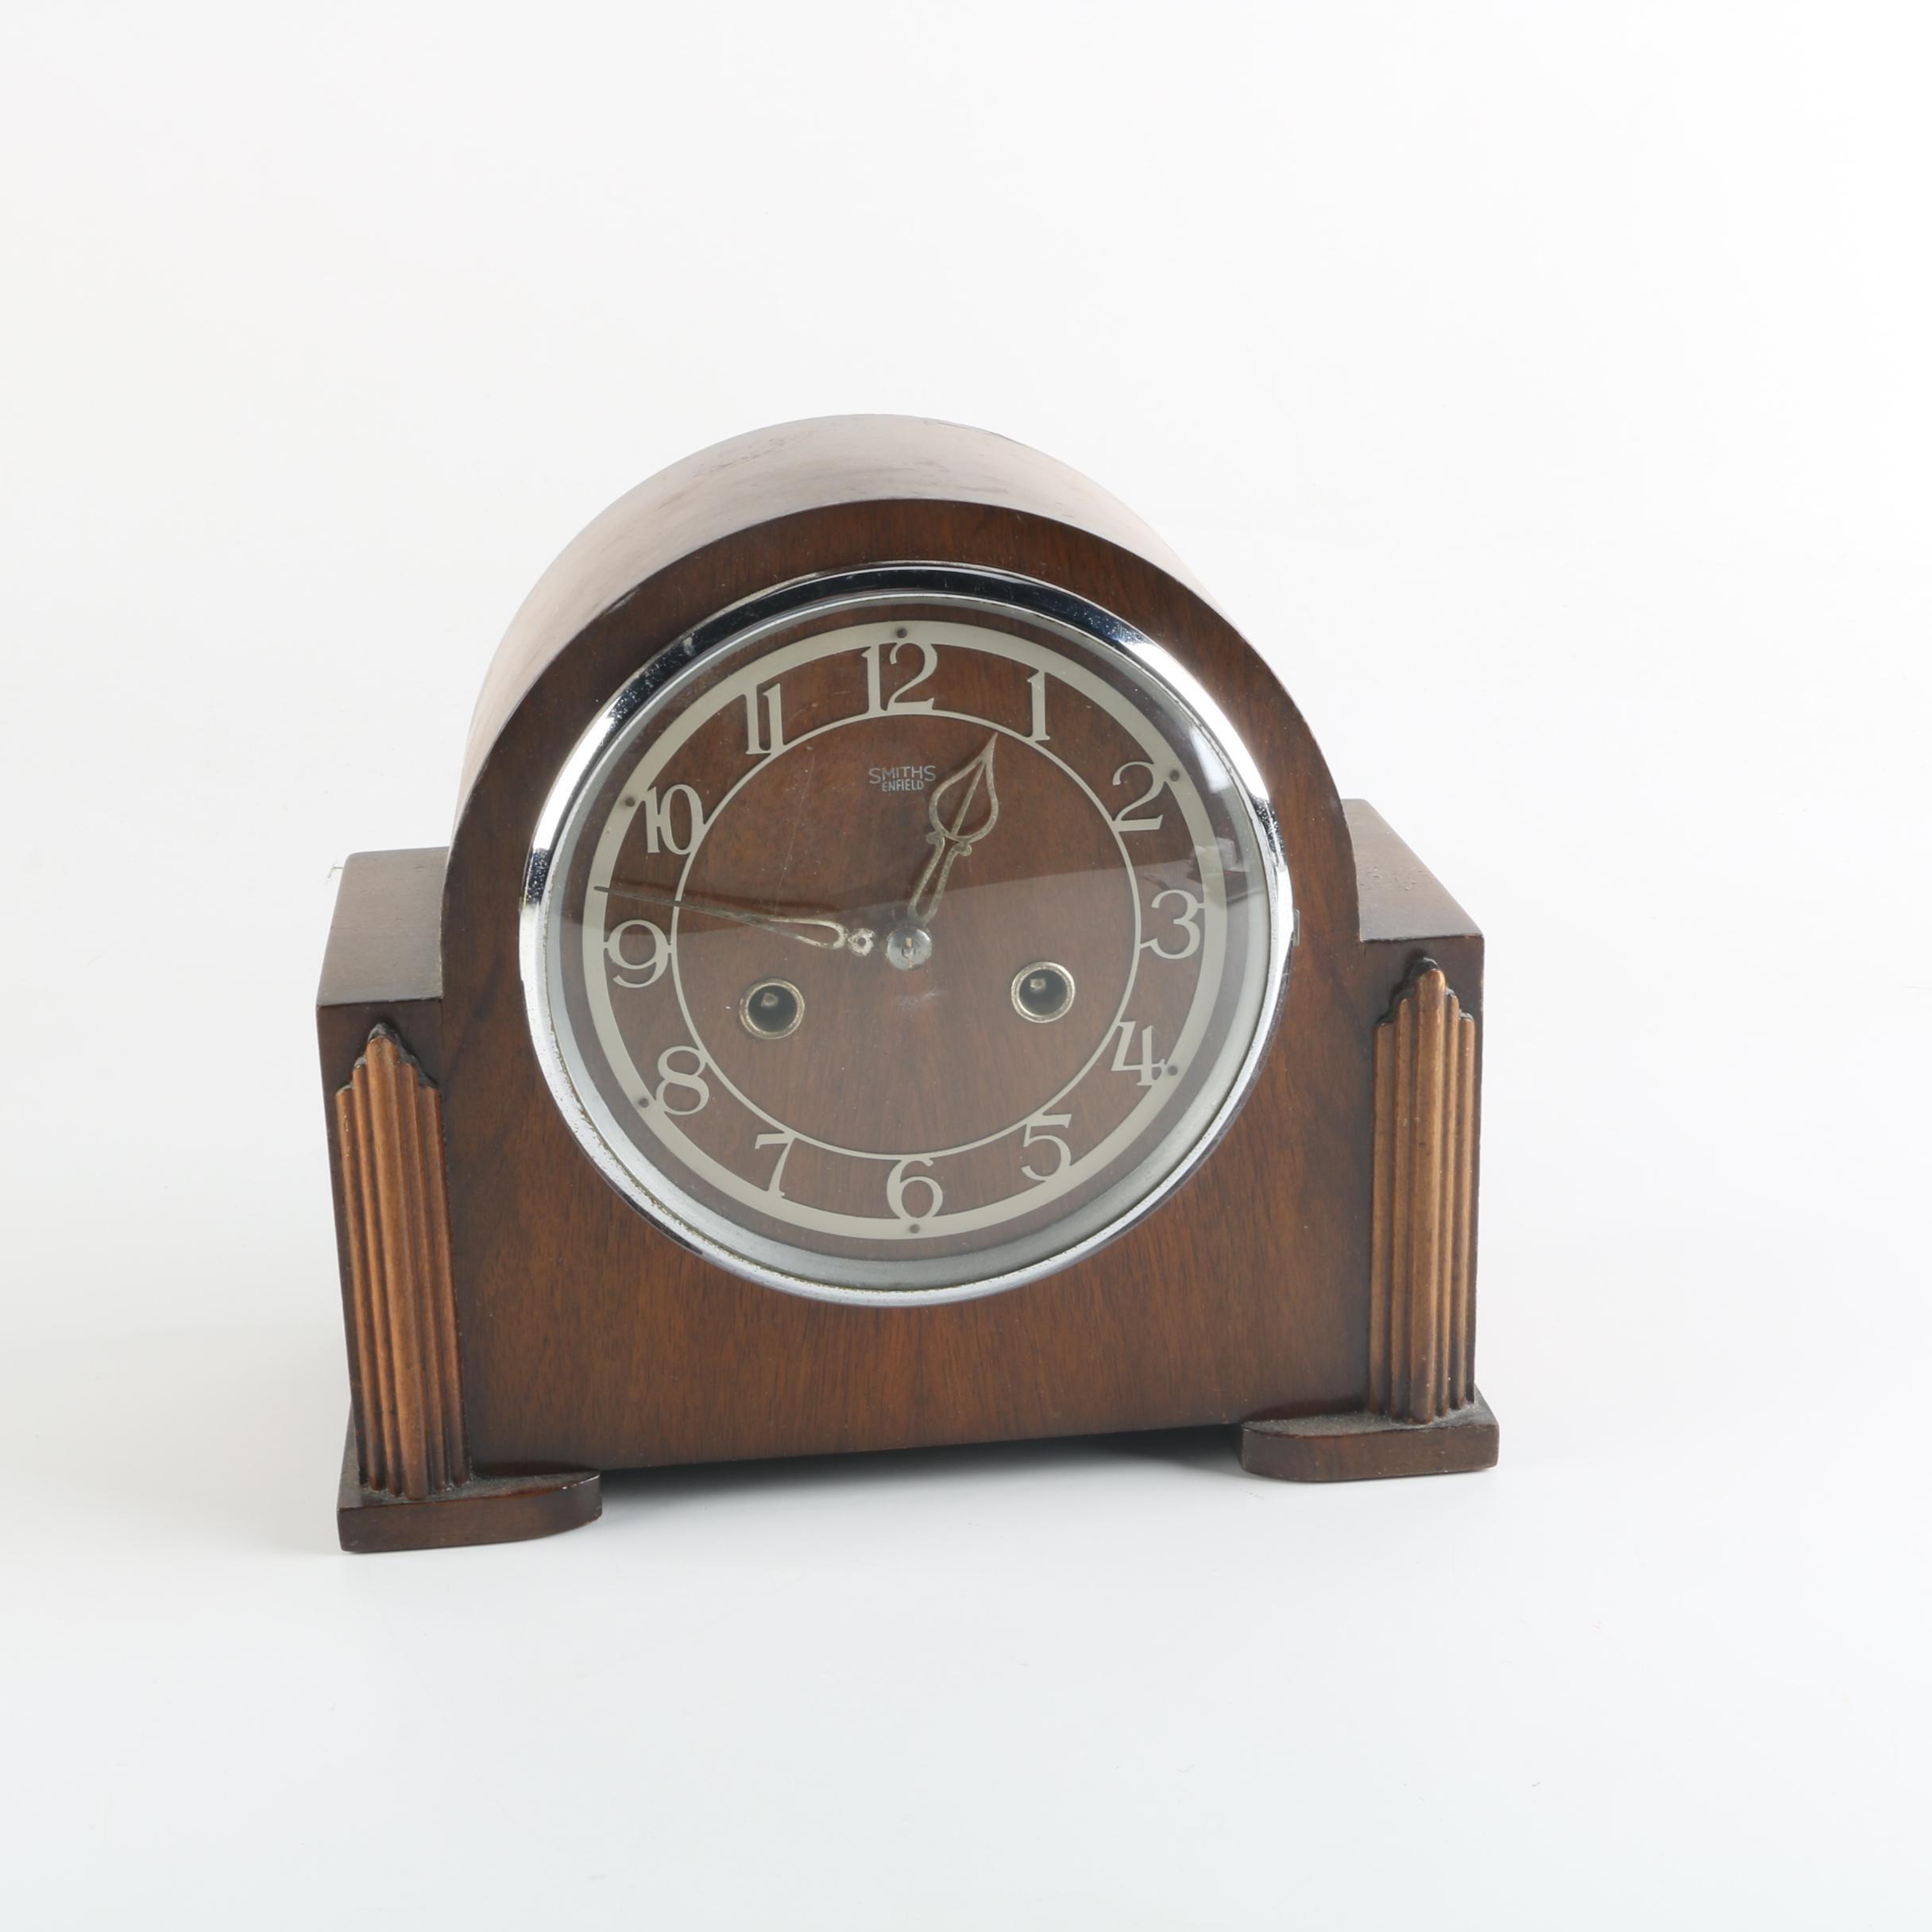 Vintage Smiths Enfield Art Deco Style Pendulum Clock